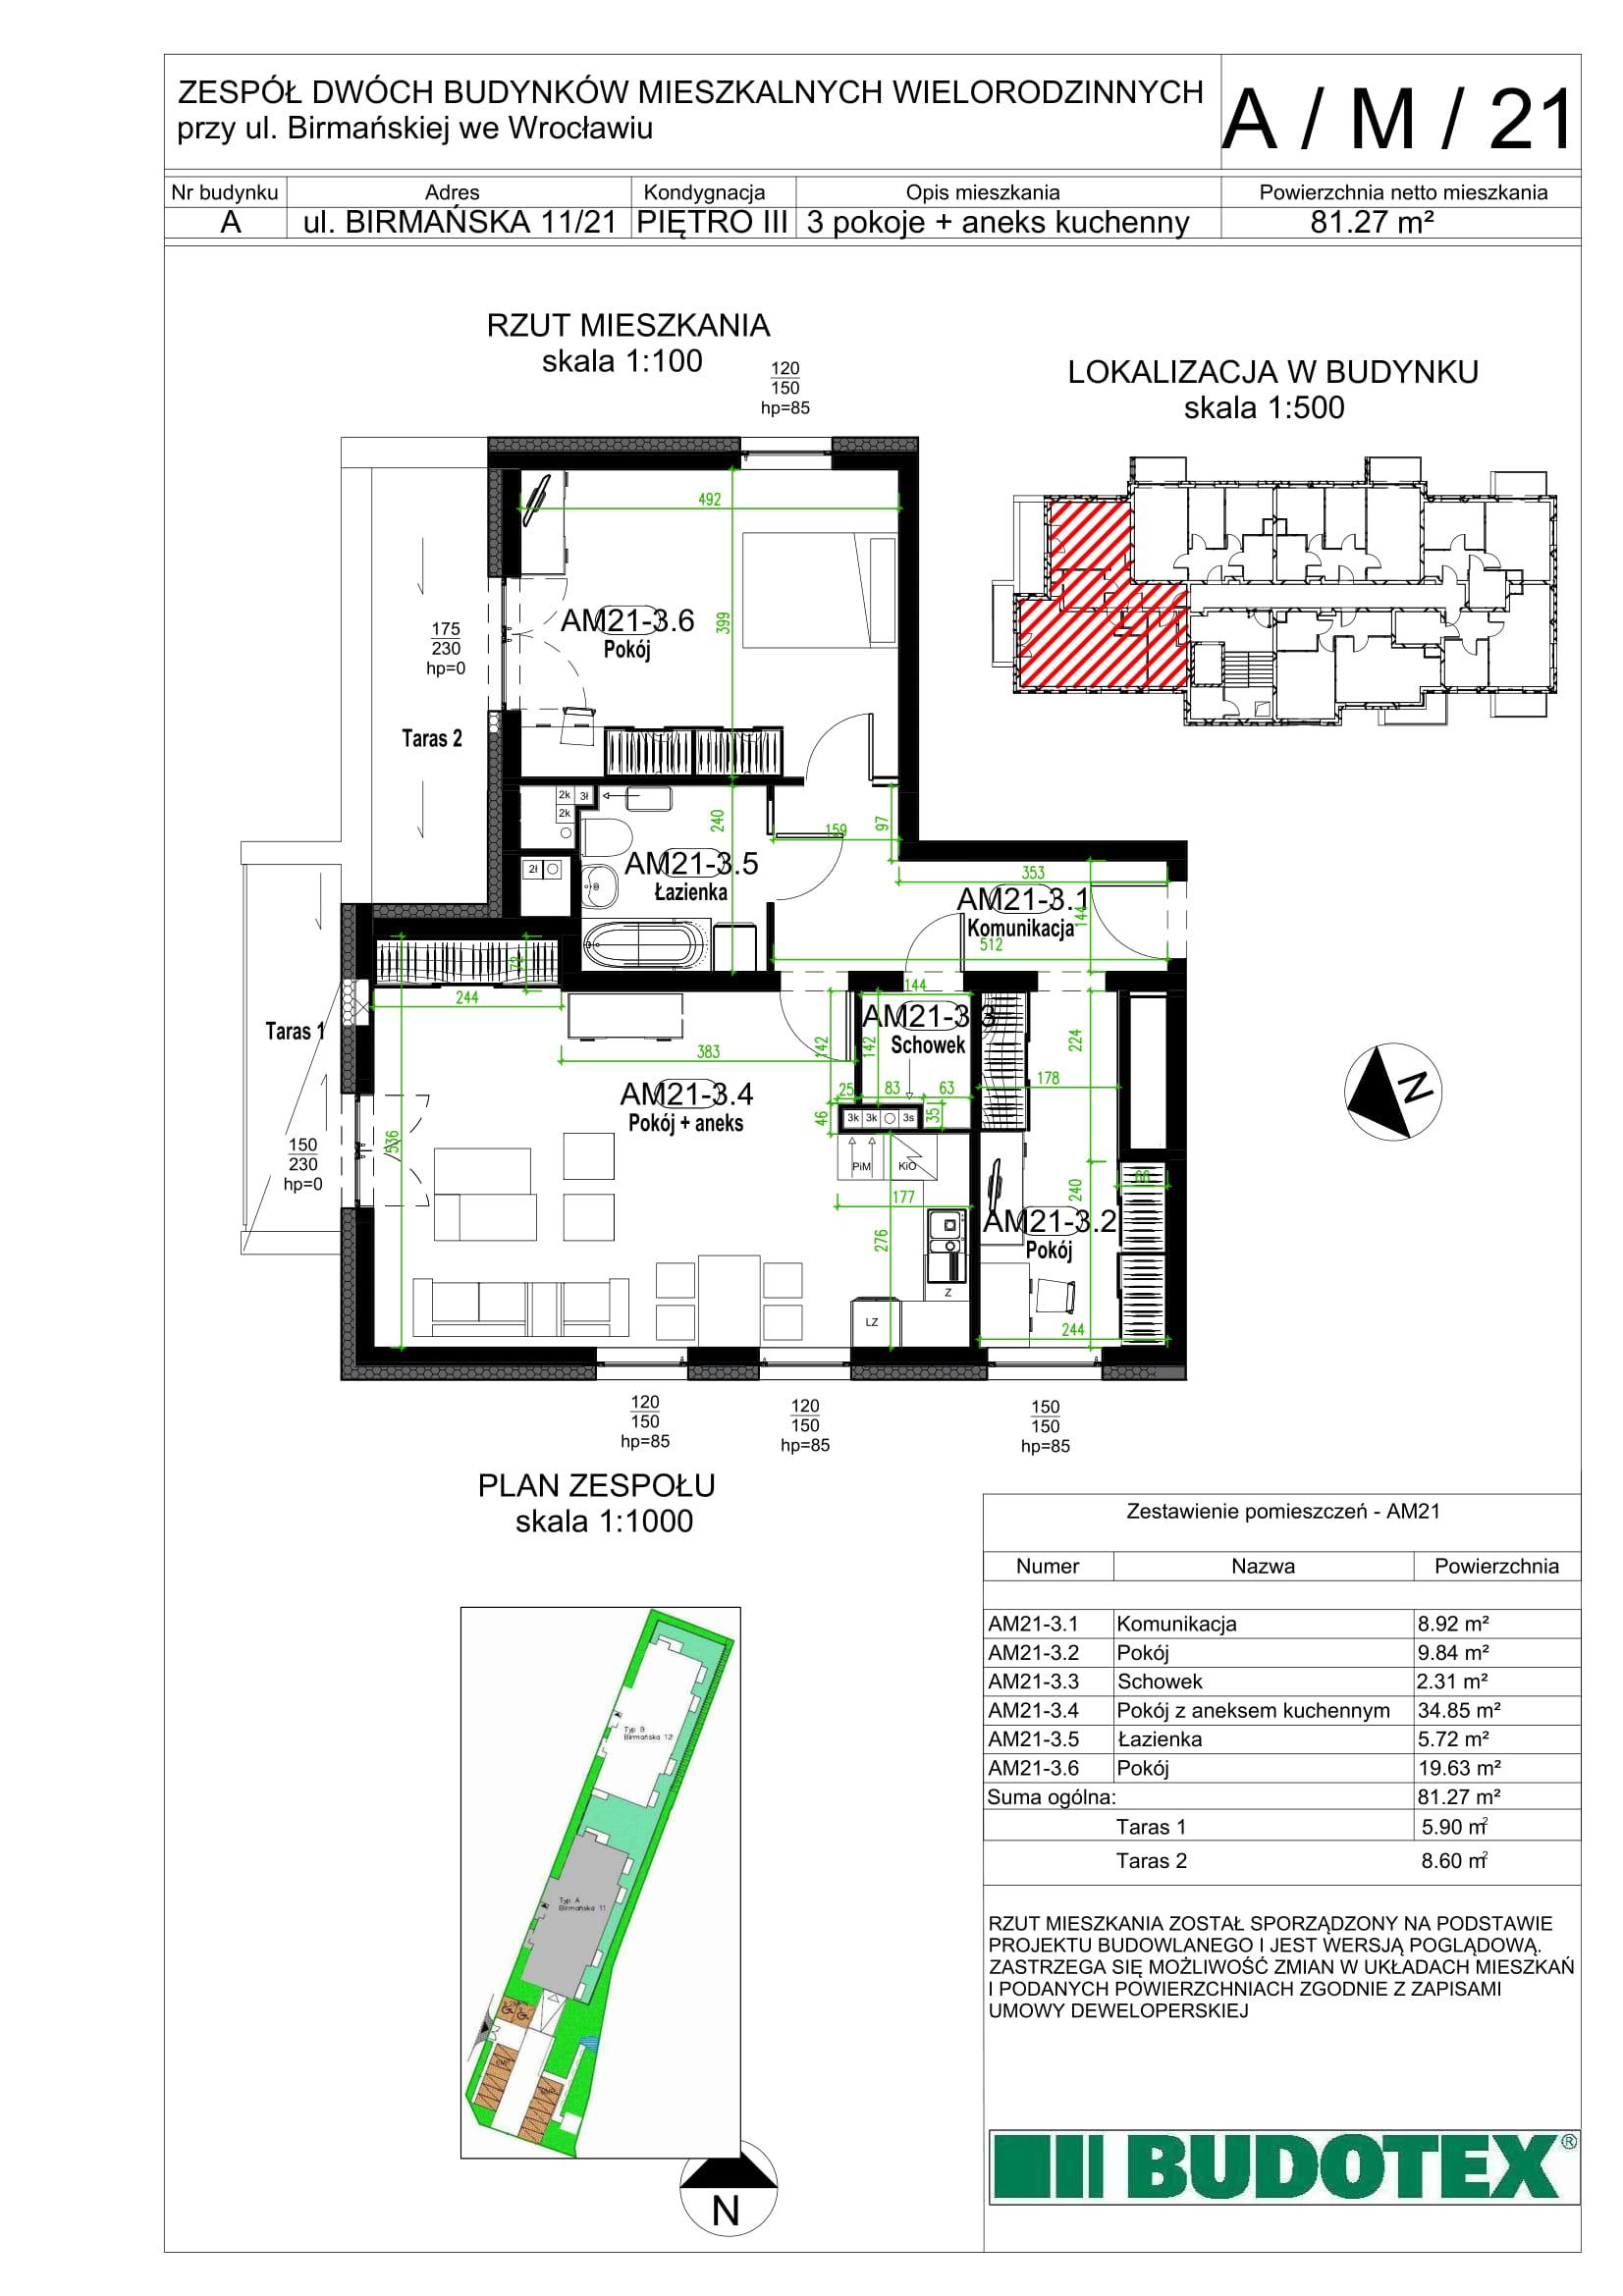 Mieszkanie nr A/M/21